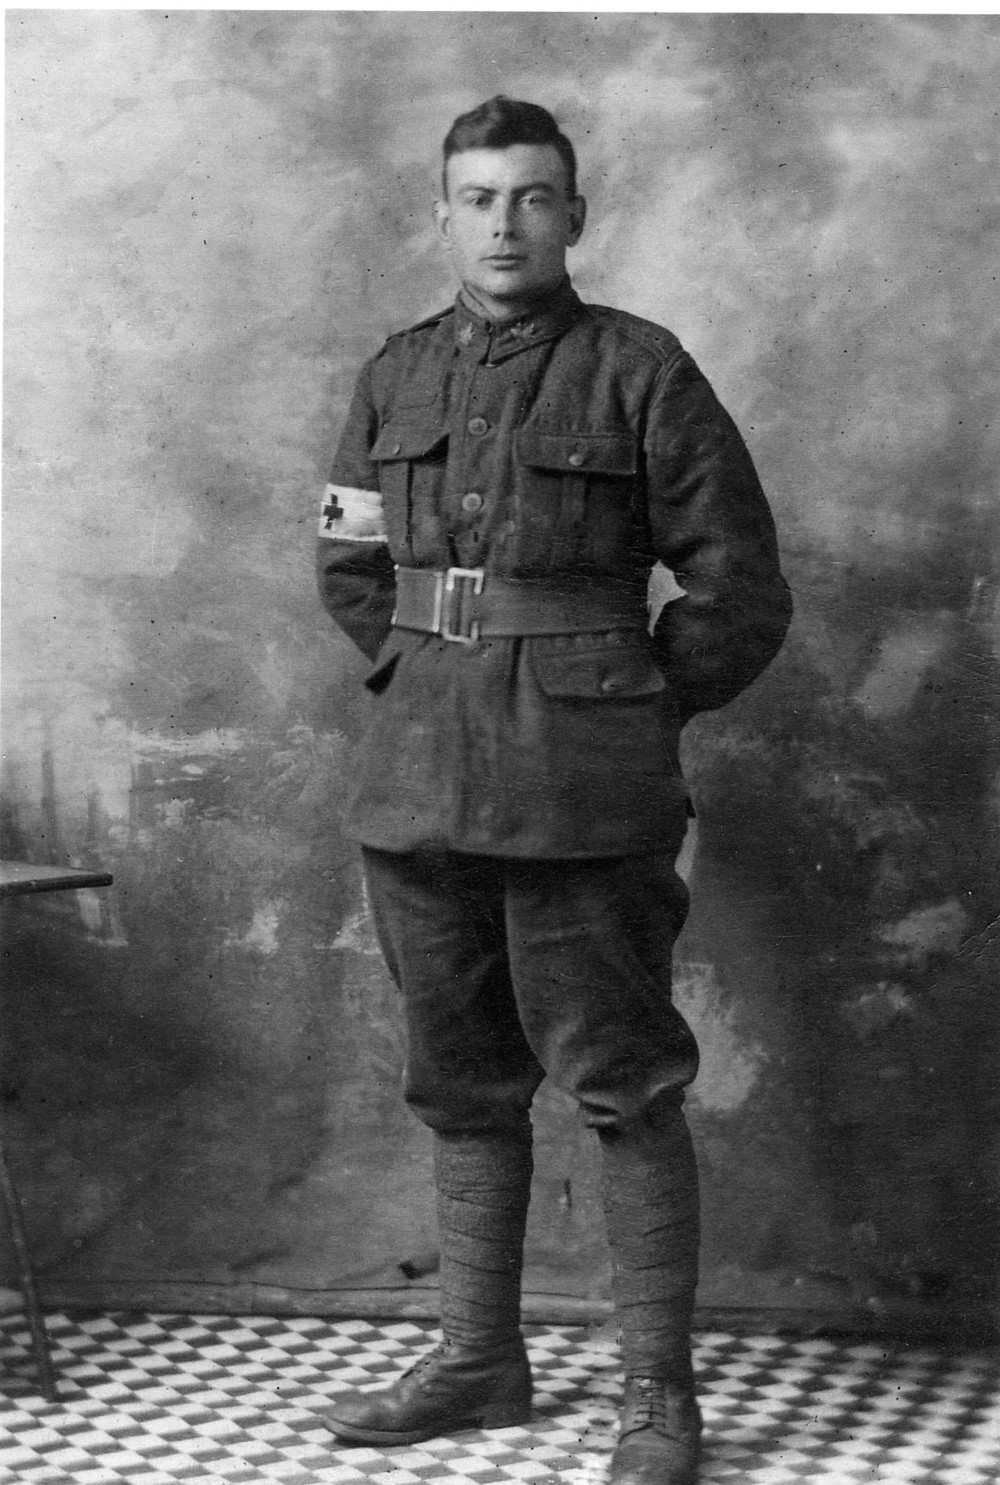 Louis Daem in uniform, 1916.